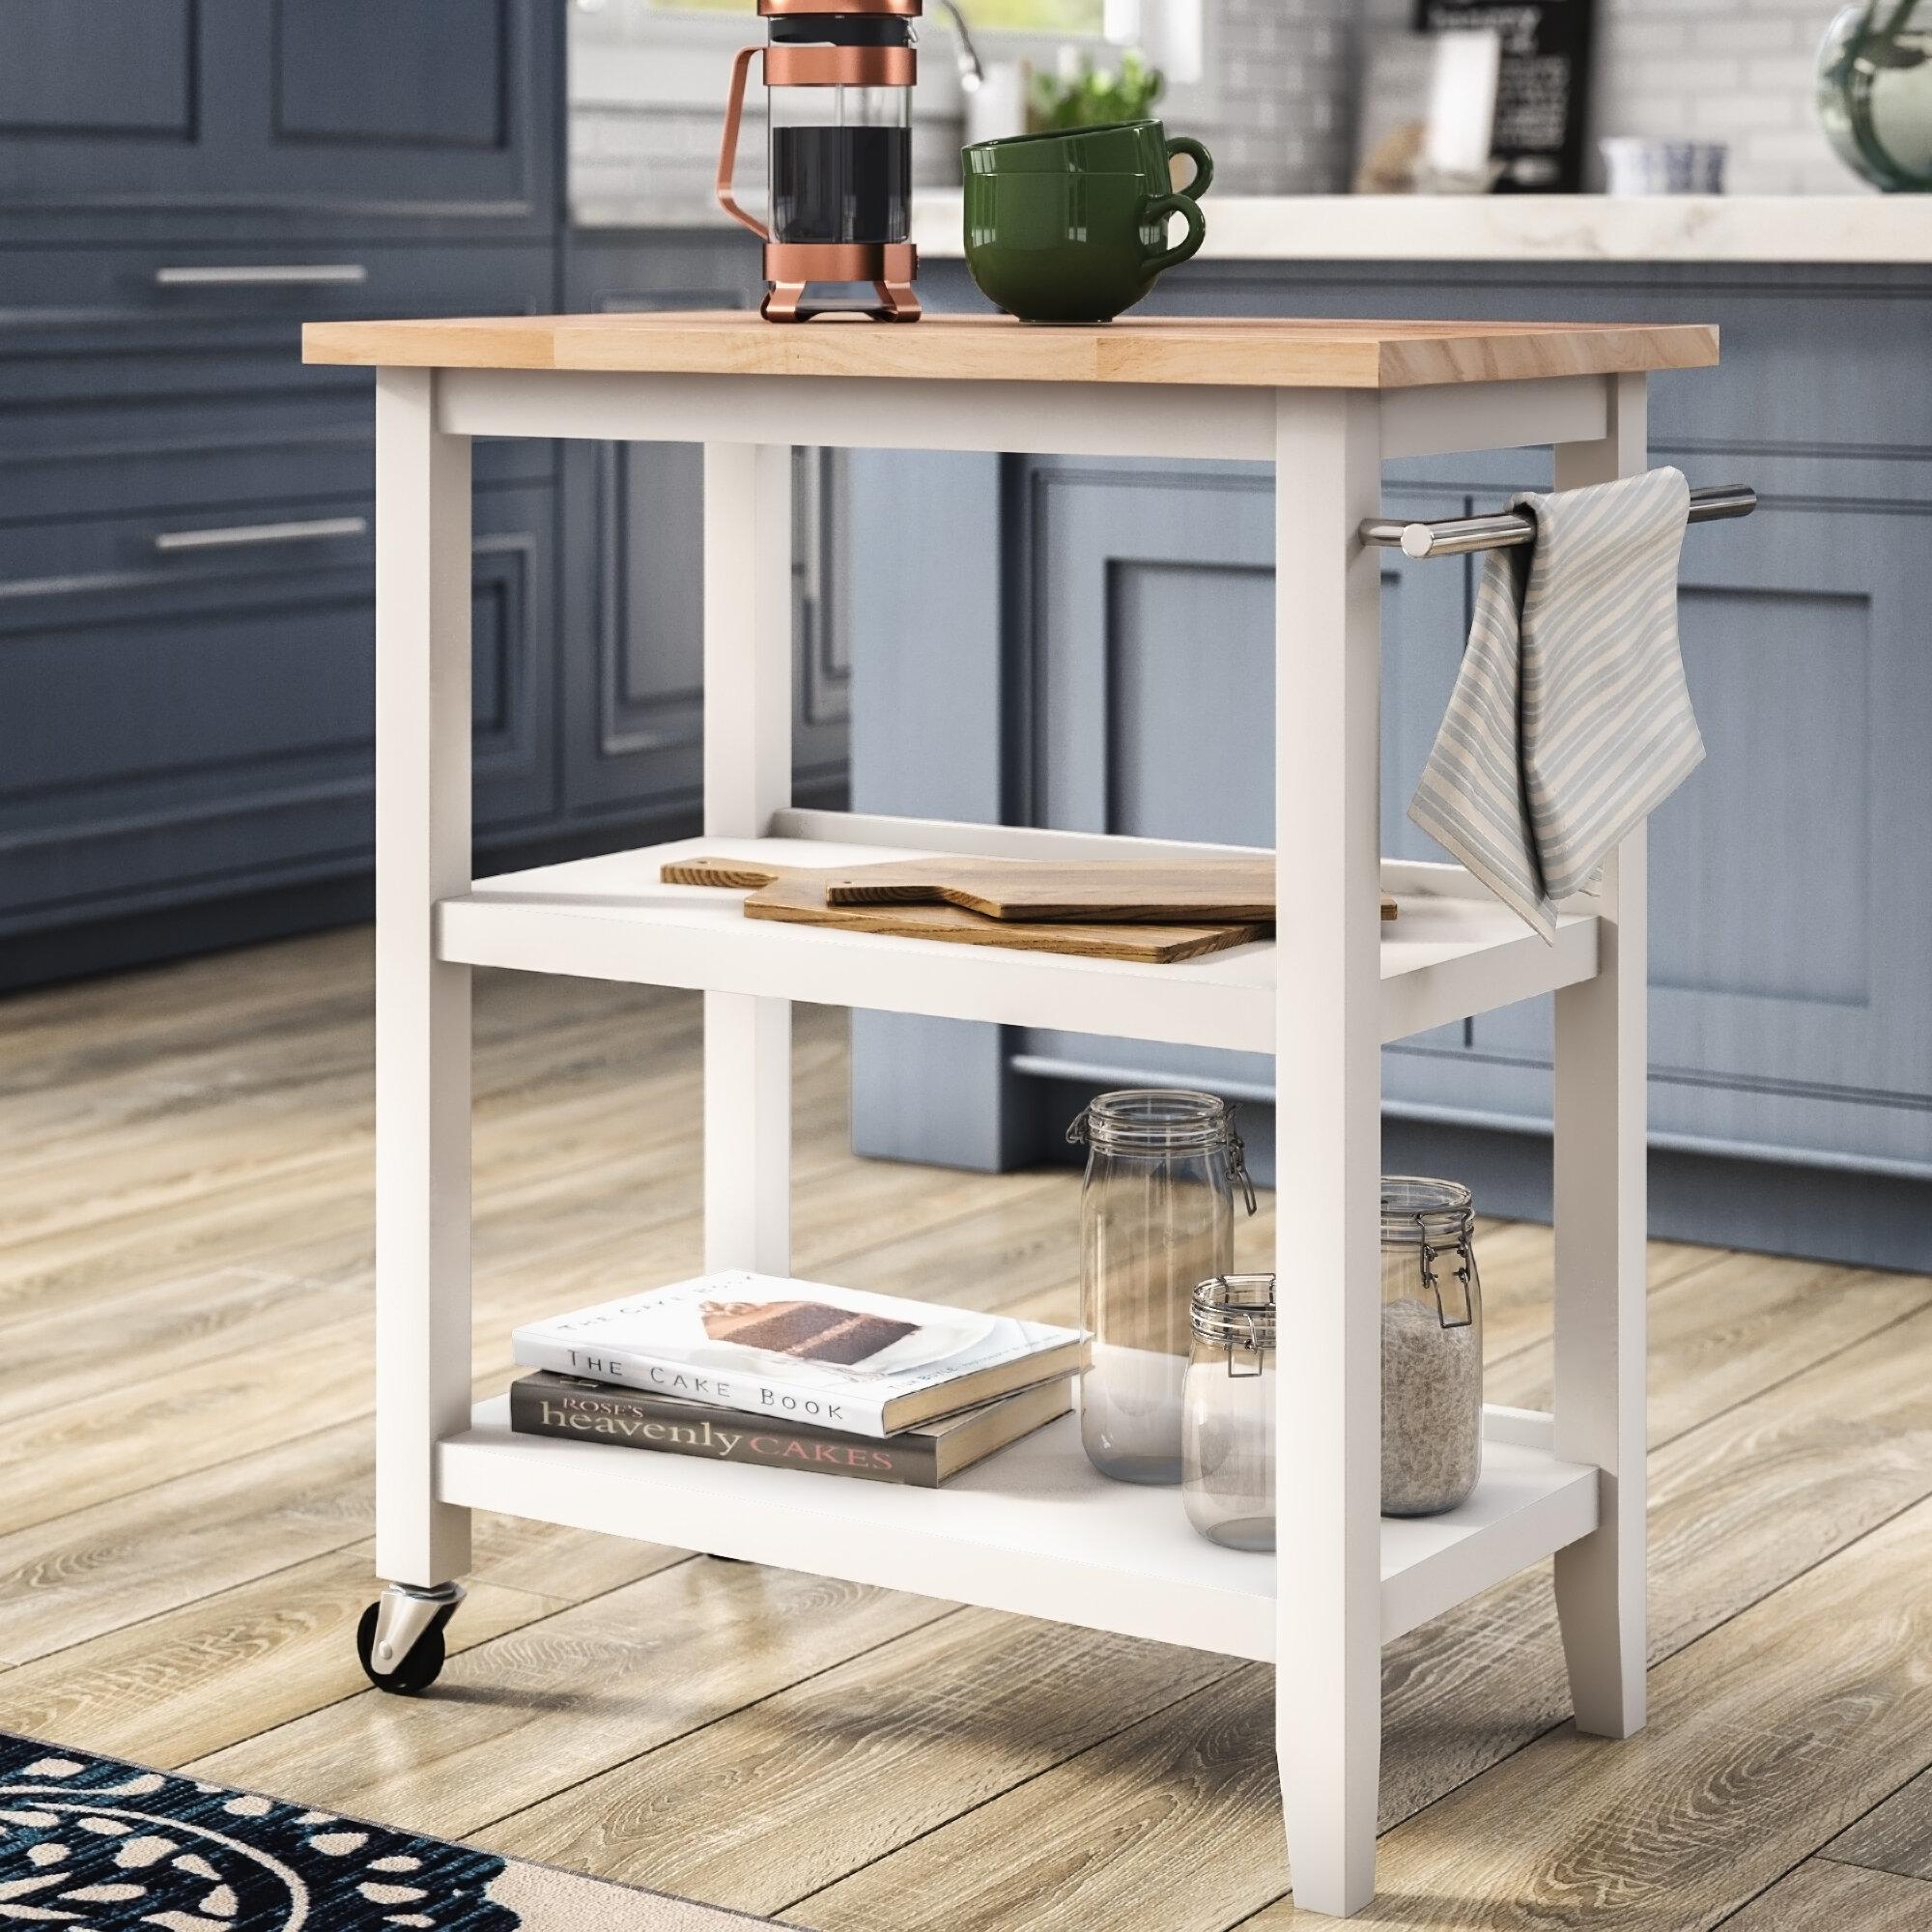 Beau Small Kitchen Islands U0026 Carts Youu0027ll Love In 2019 | Wayfair